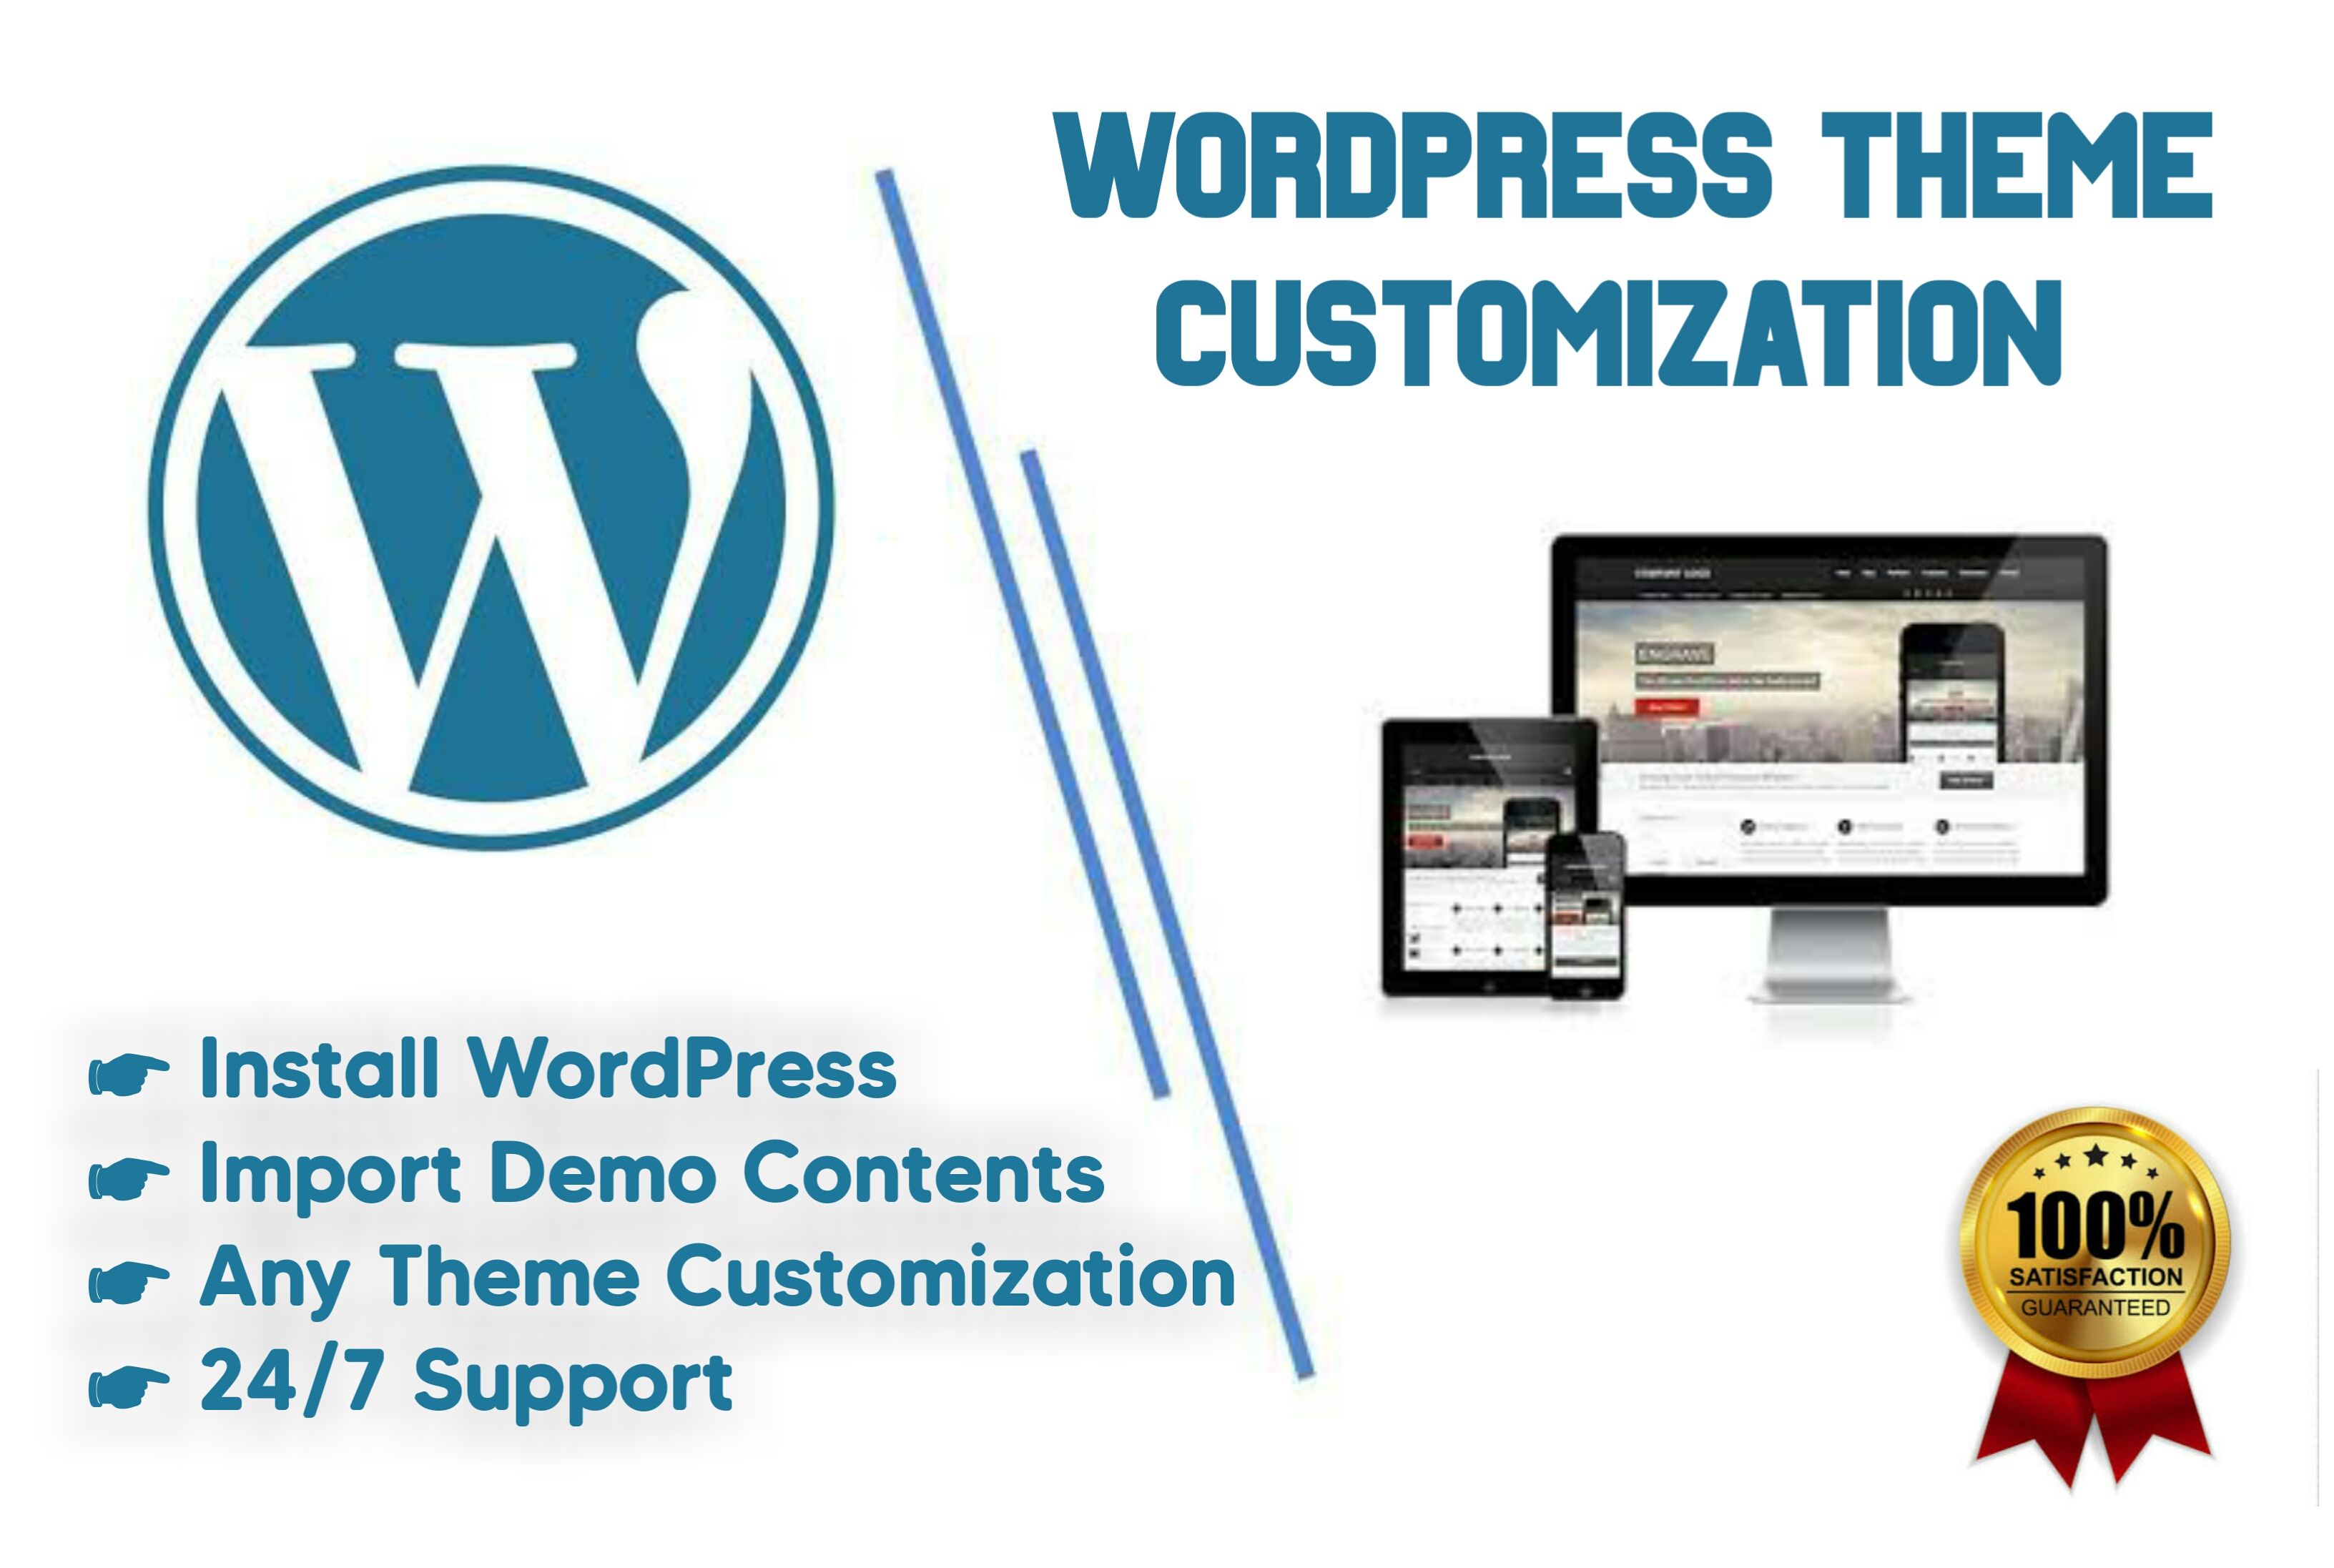 I will install wordpress,  theme customization and demo import